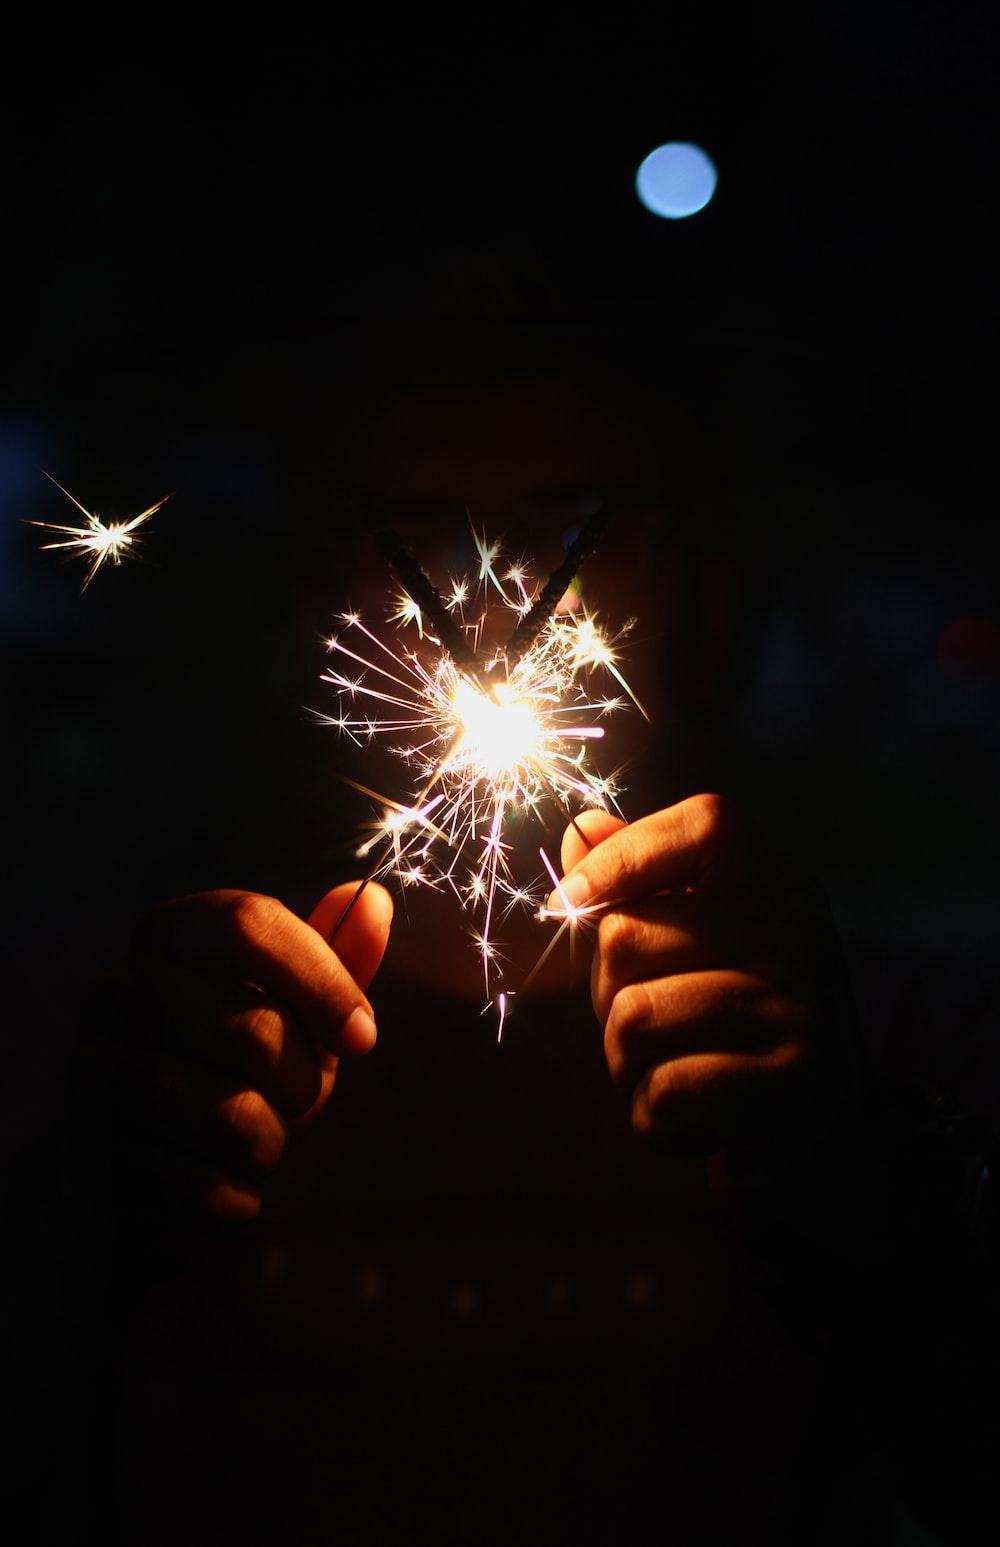 person holding lighted sparkler in dark room